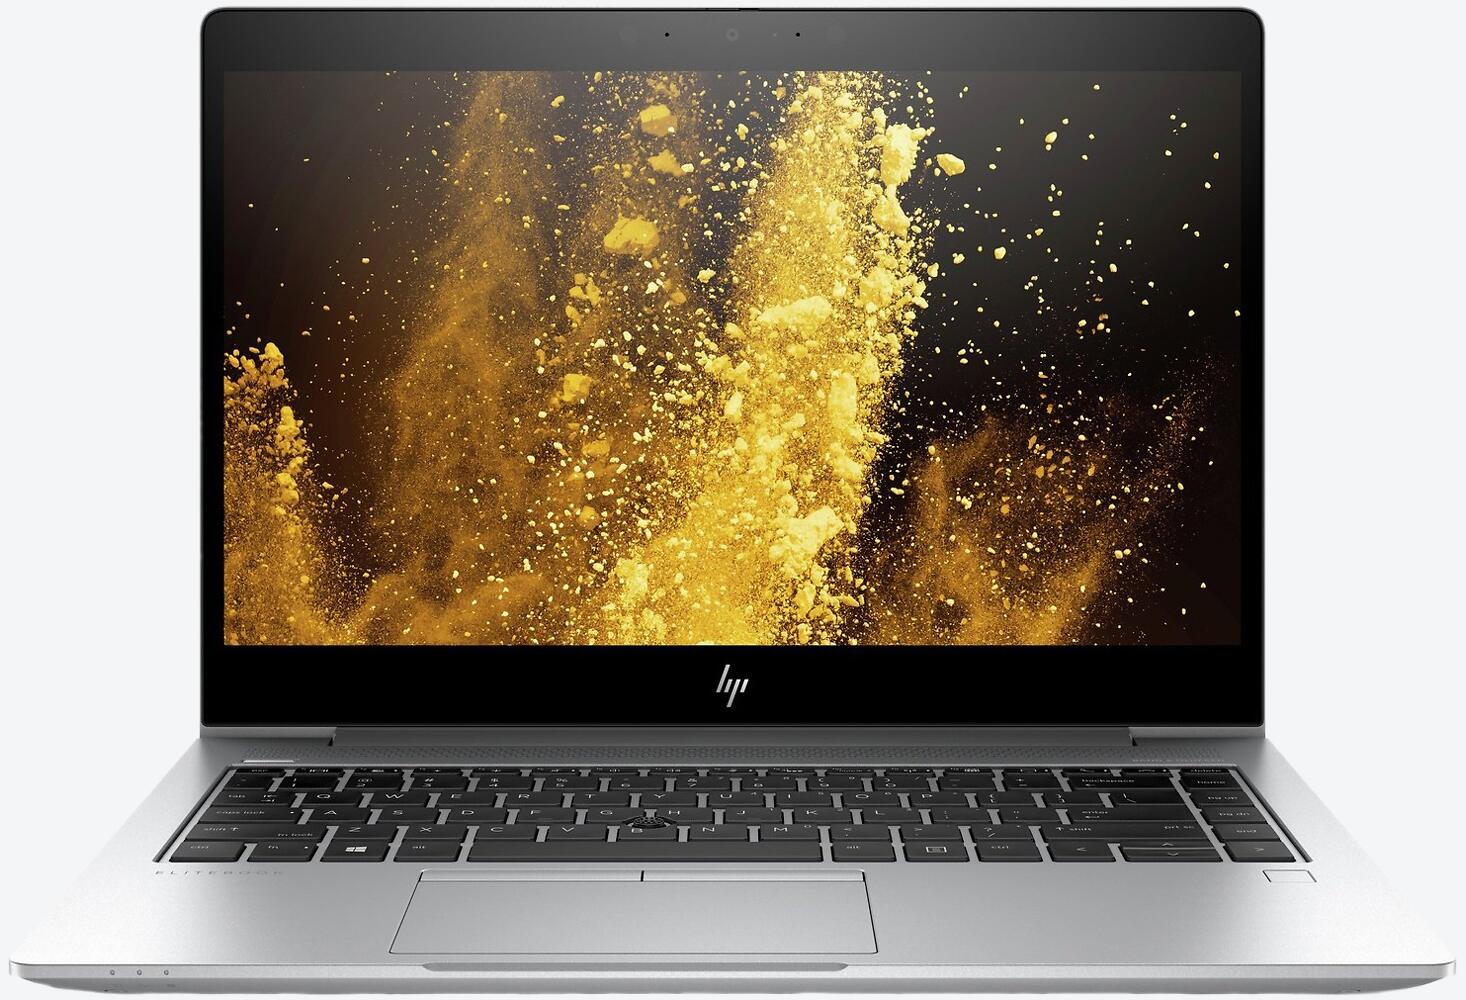 HP EliteBook 840 G6 (7KN31EA) LTE